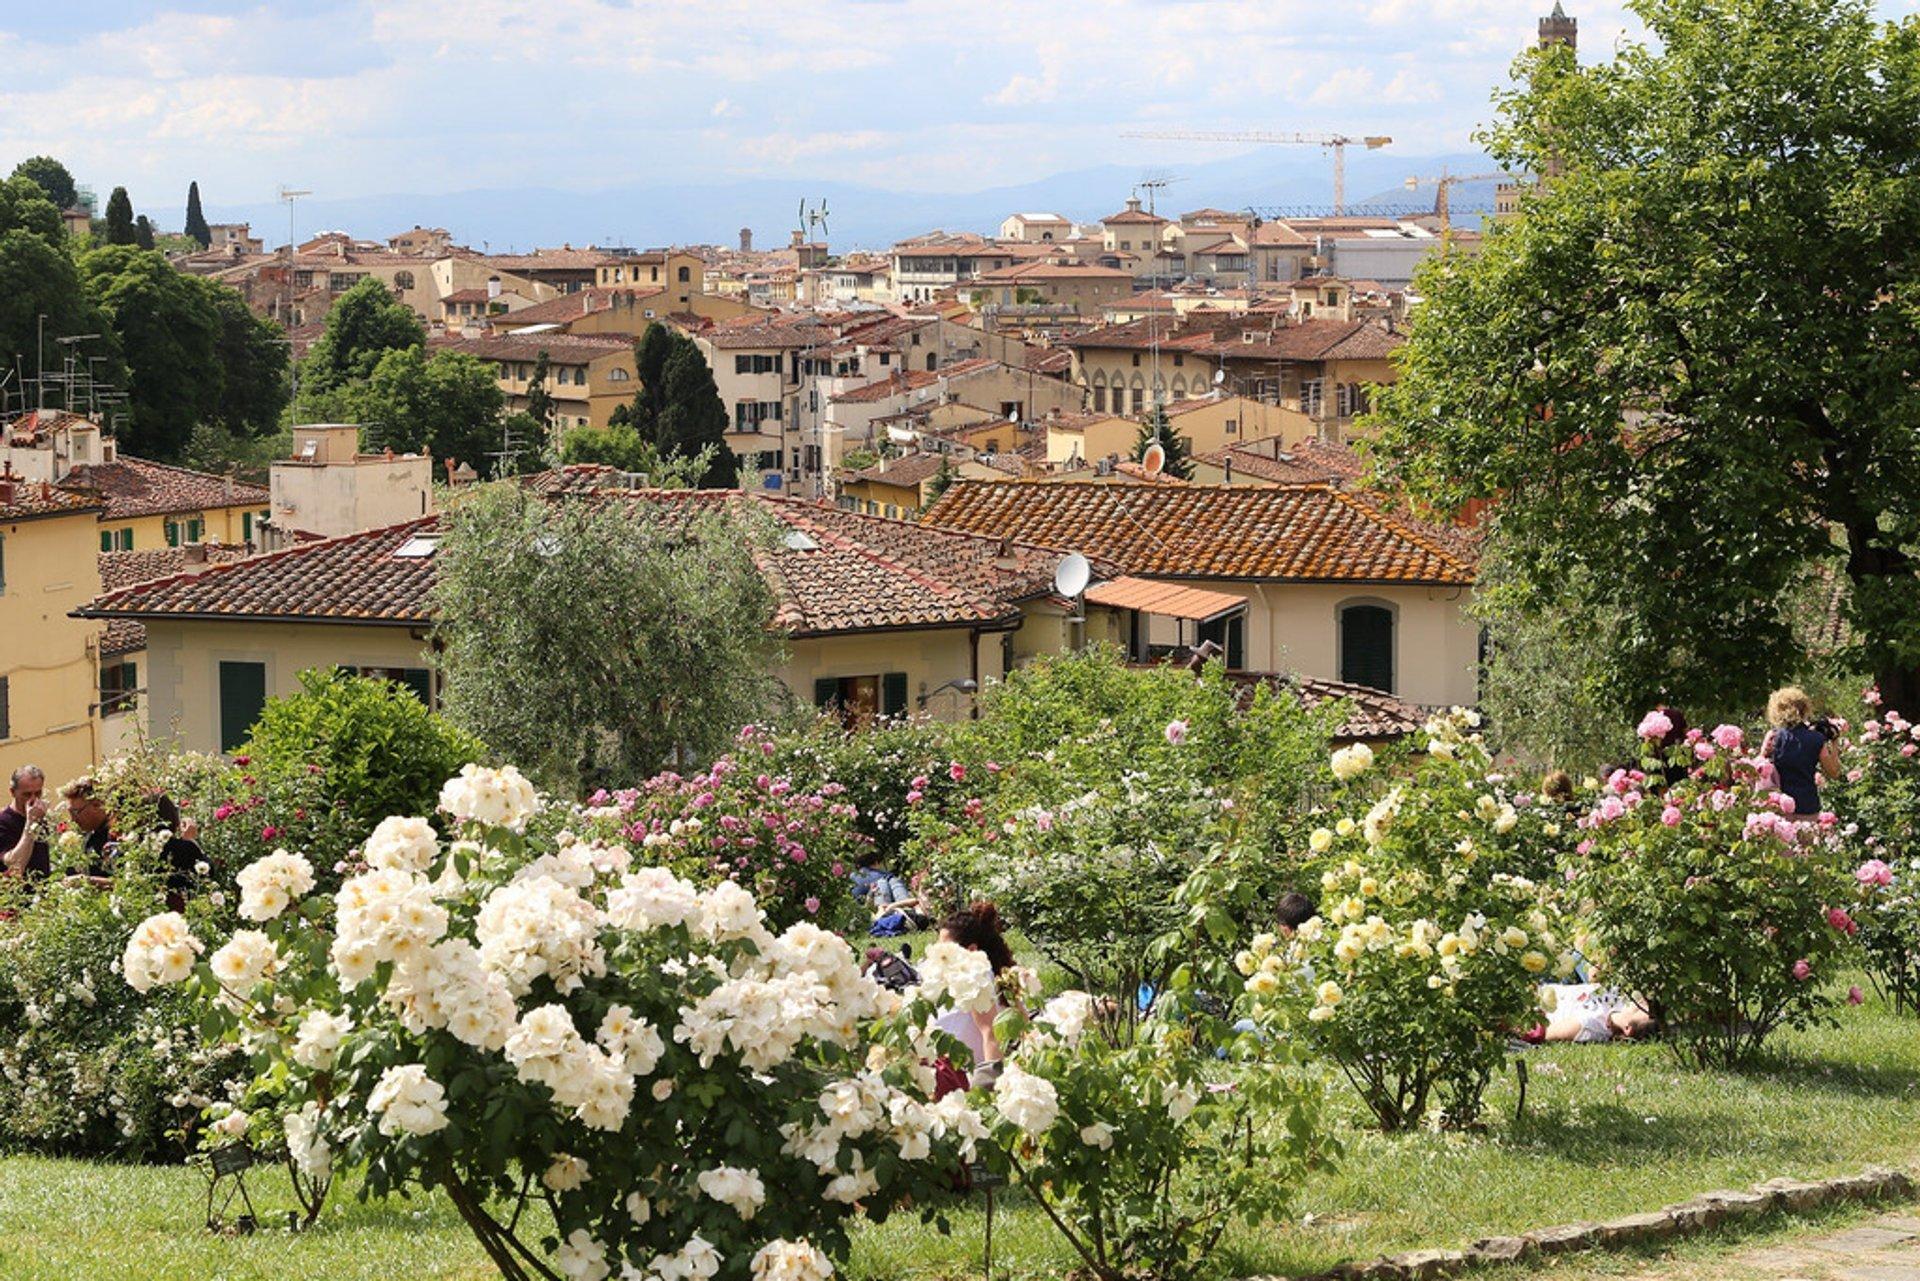 The Rose Garden (Giardino delle rose), Florence, Tuscany 2020